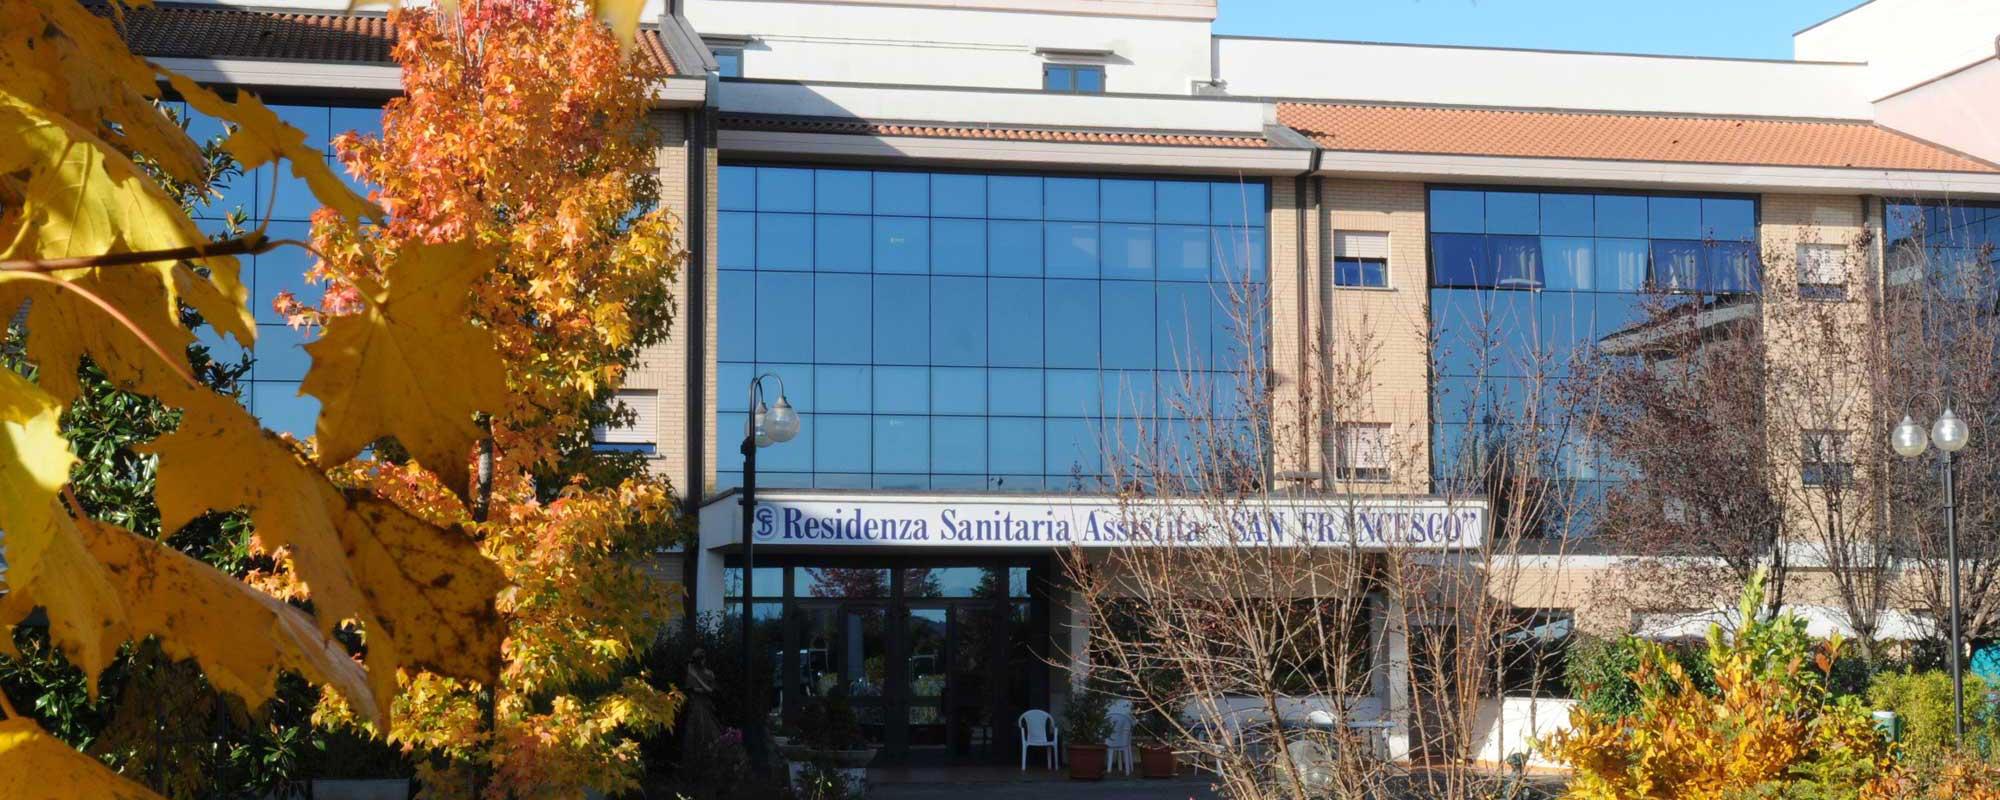 <h2>Residenza Sanitaria Assistenziale</h2>  <h1>San Francesco</h1>